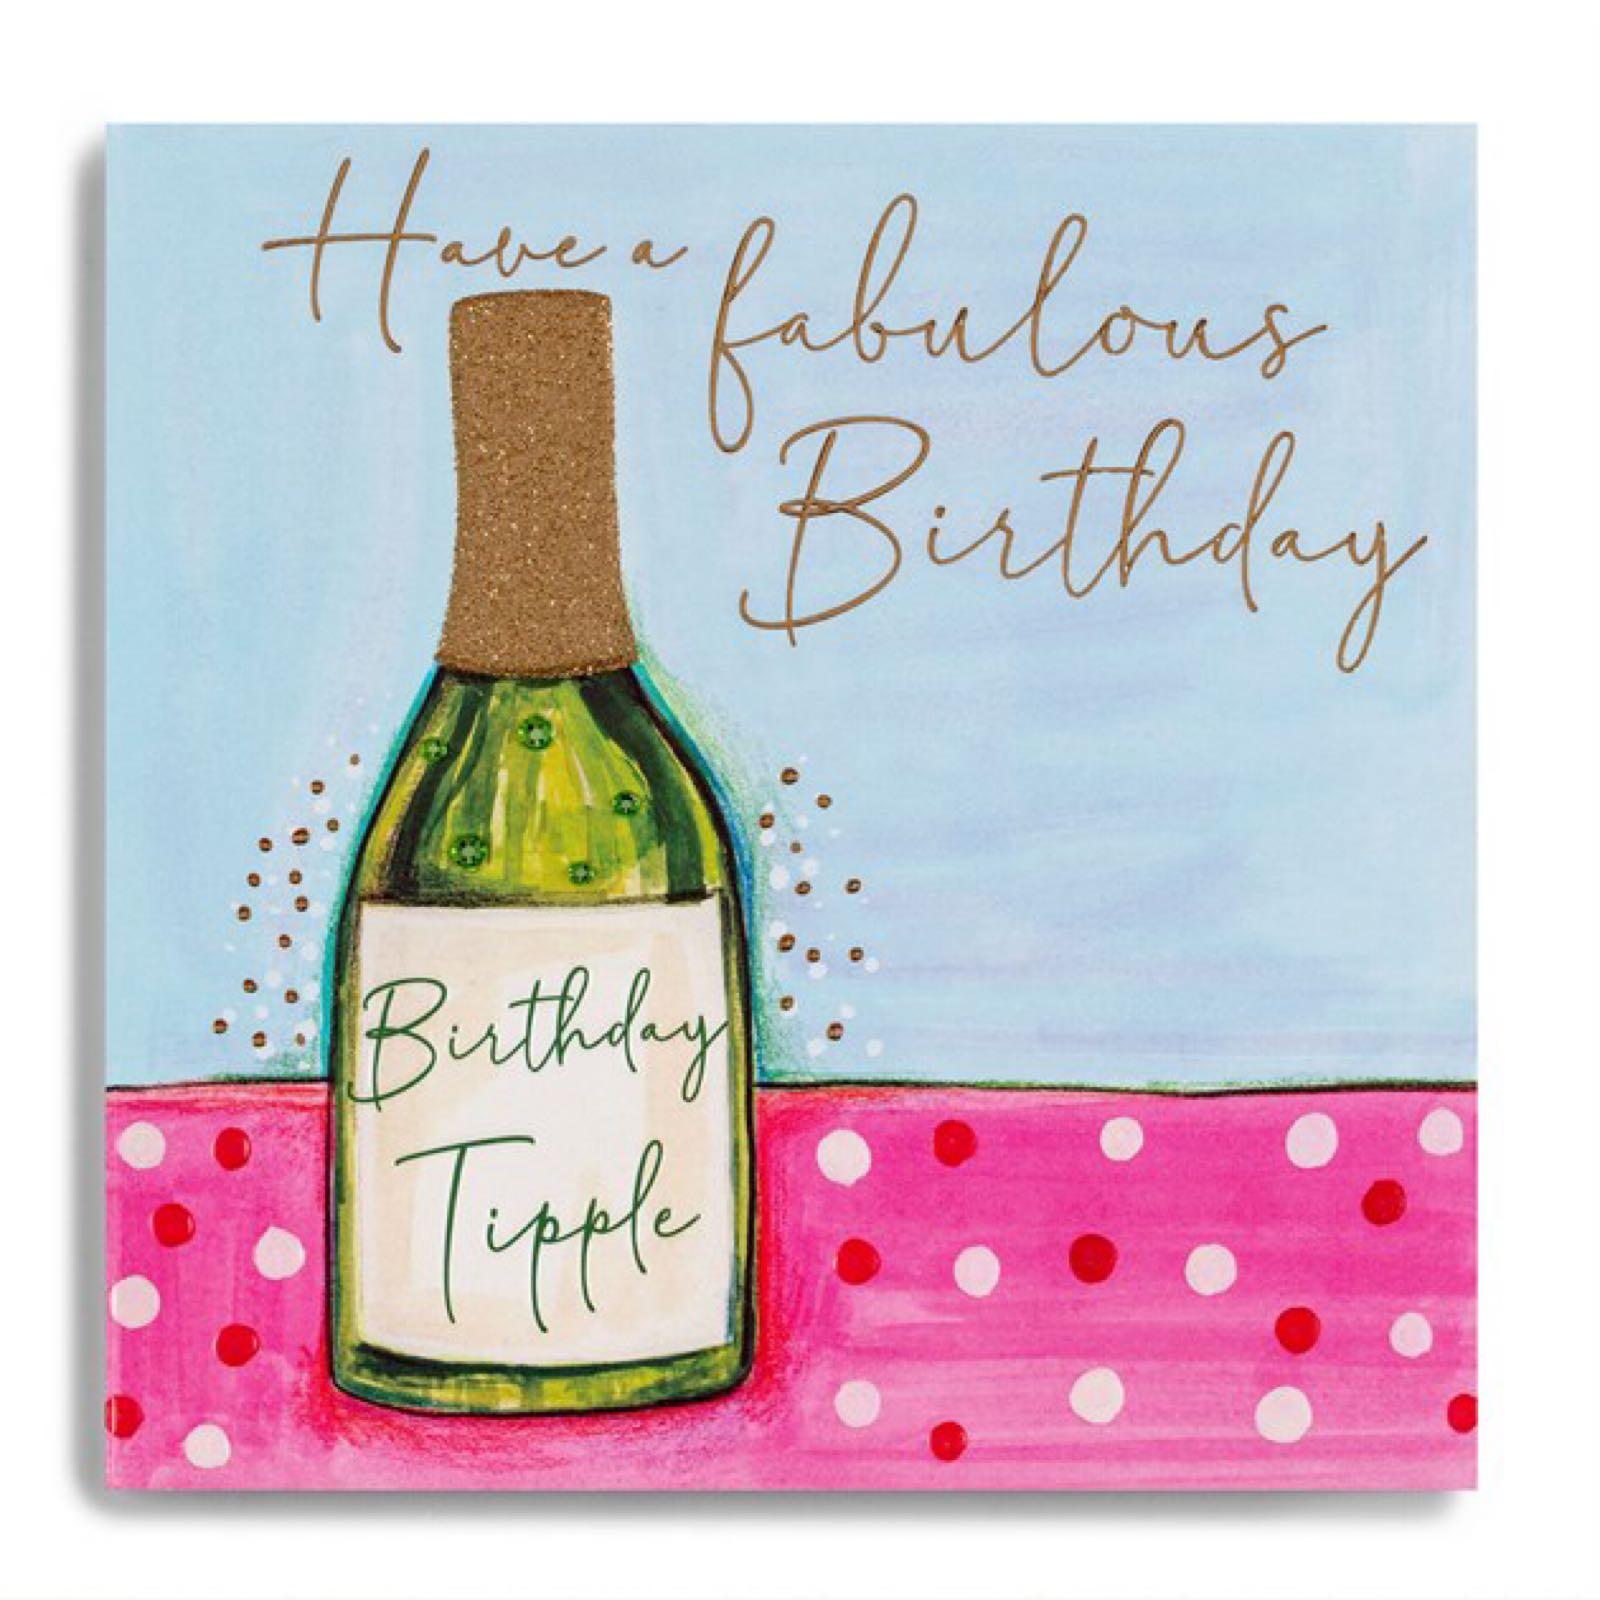 Janie Wilson Birthday tipple card